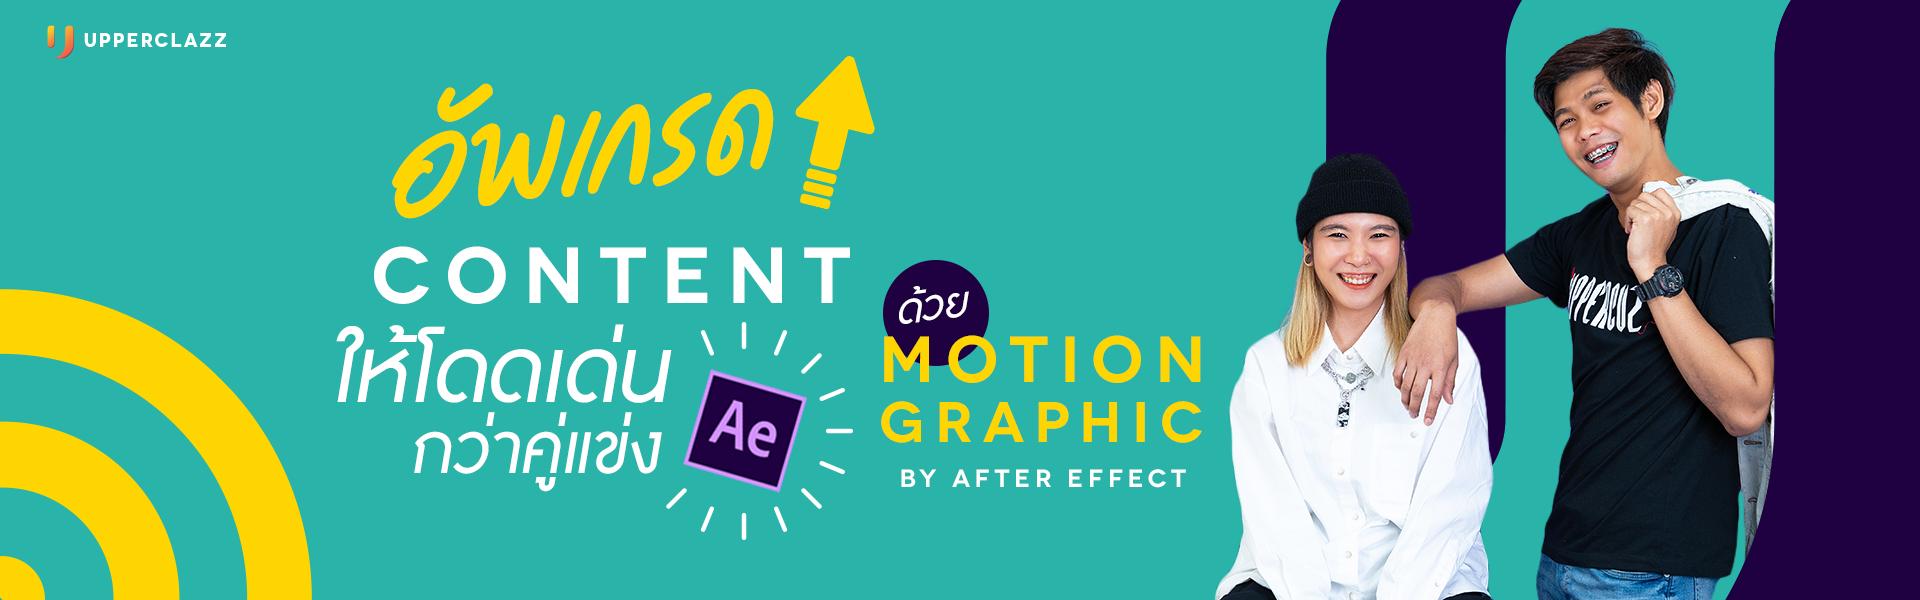 Upgrade Content ให้เด่นกว่าคู่แข่งด้วย Motion Graphic ง่ายๆ ผ่านโปรแกรม After Effect